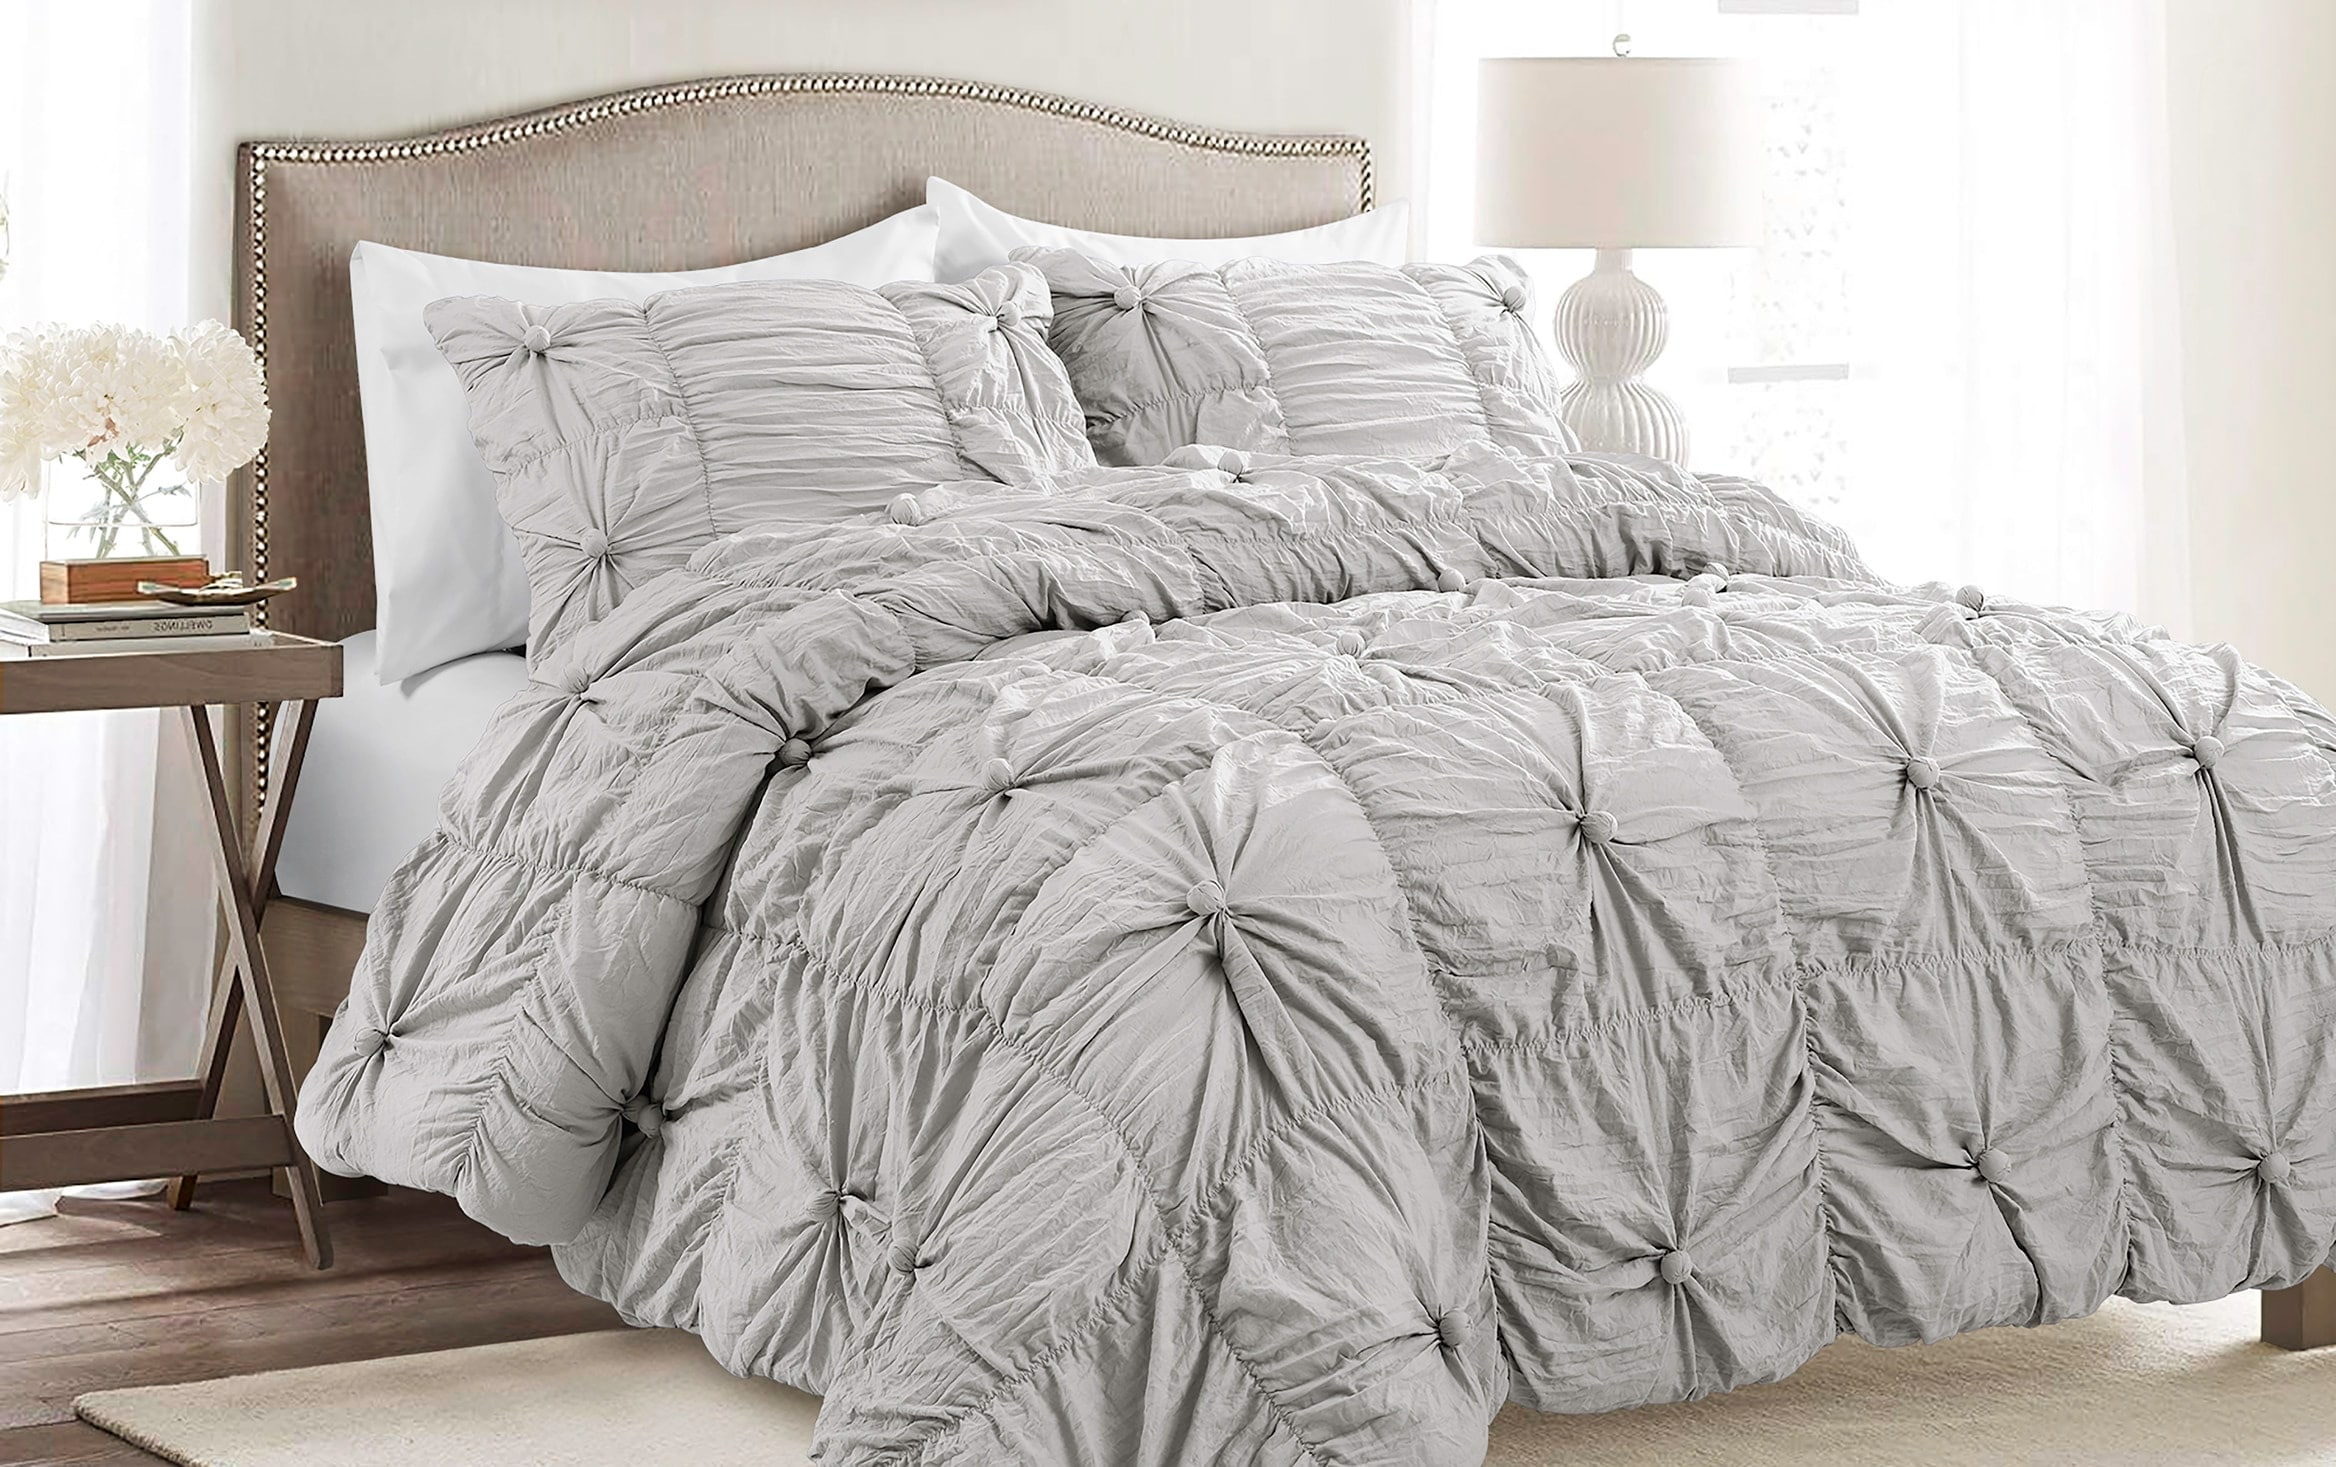 Belle 3 Piece Full Queen Light Gray Comforter Set Bobs Com